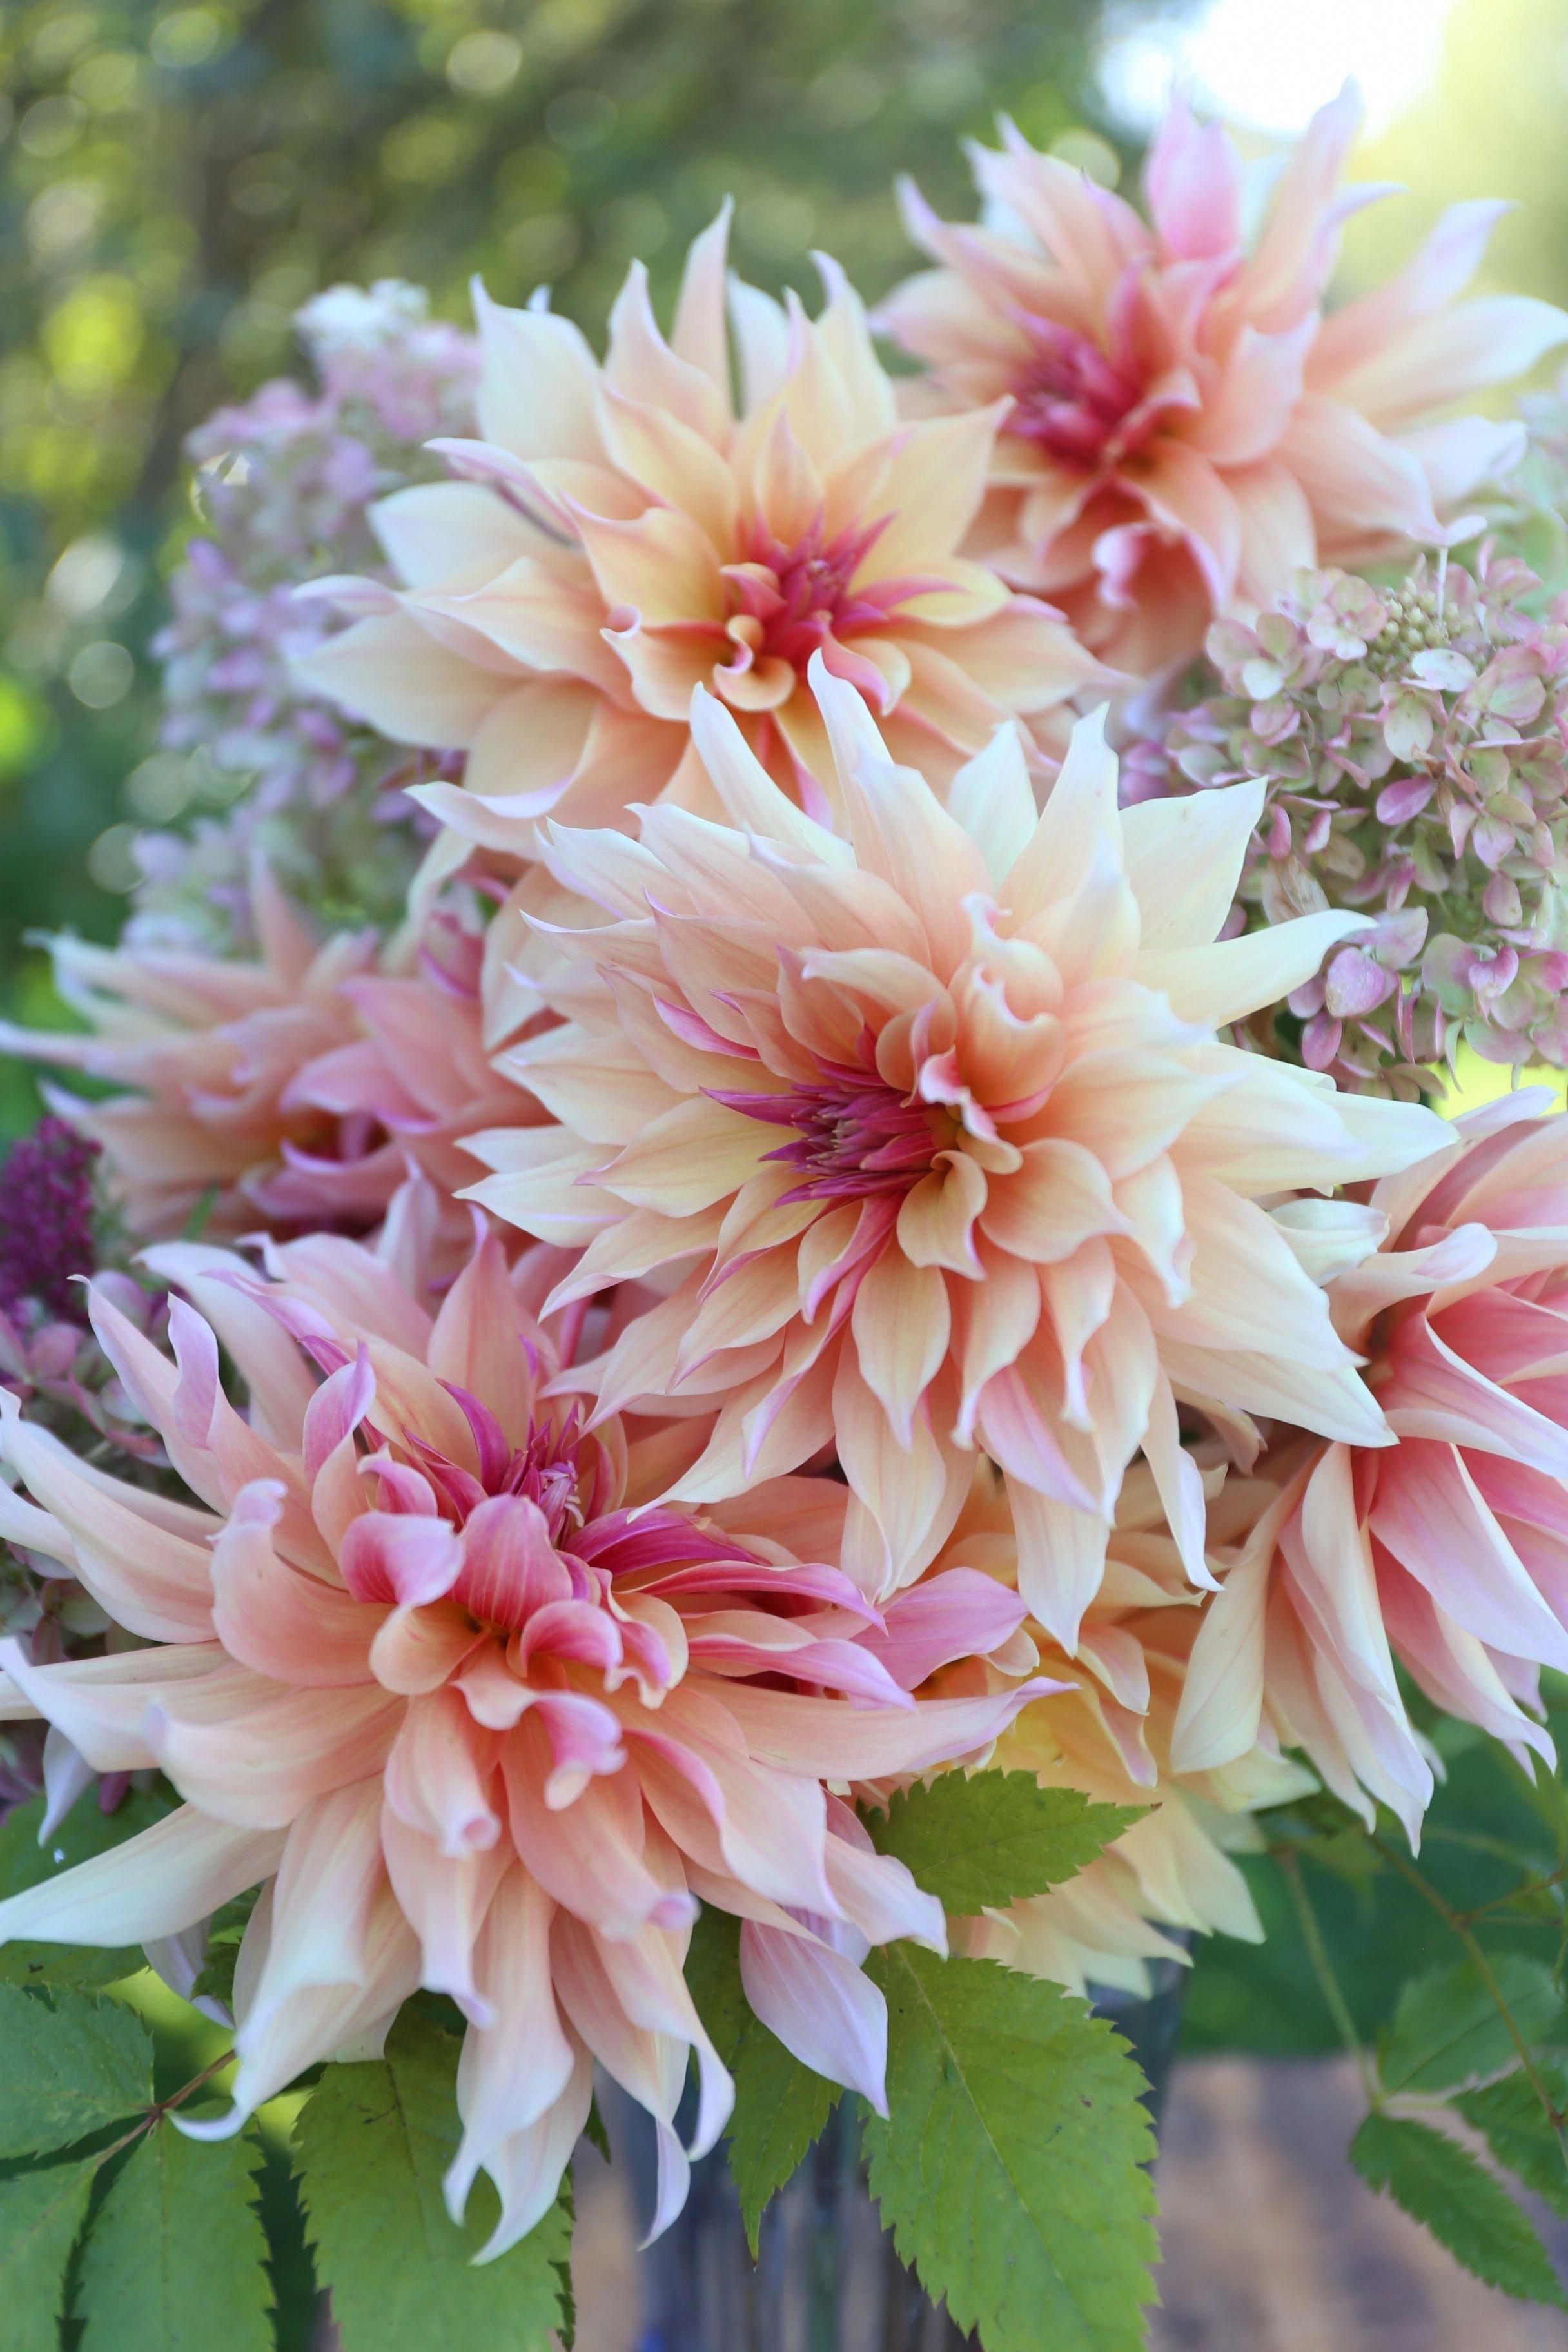 Outdoor Lighting Ideas For Your Garden Dahlia Flower Faux Flowers Arrangements Flower Garden Design